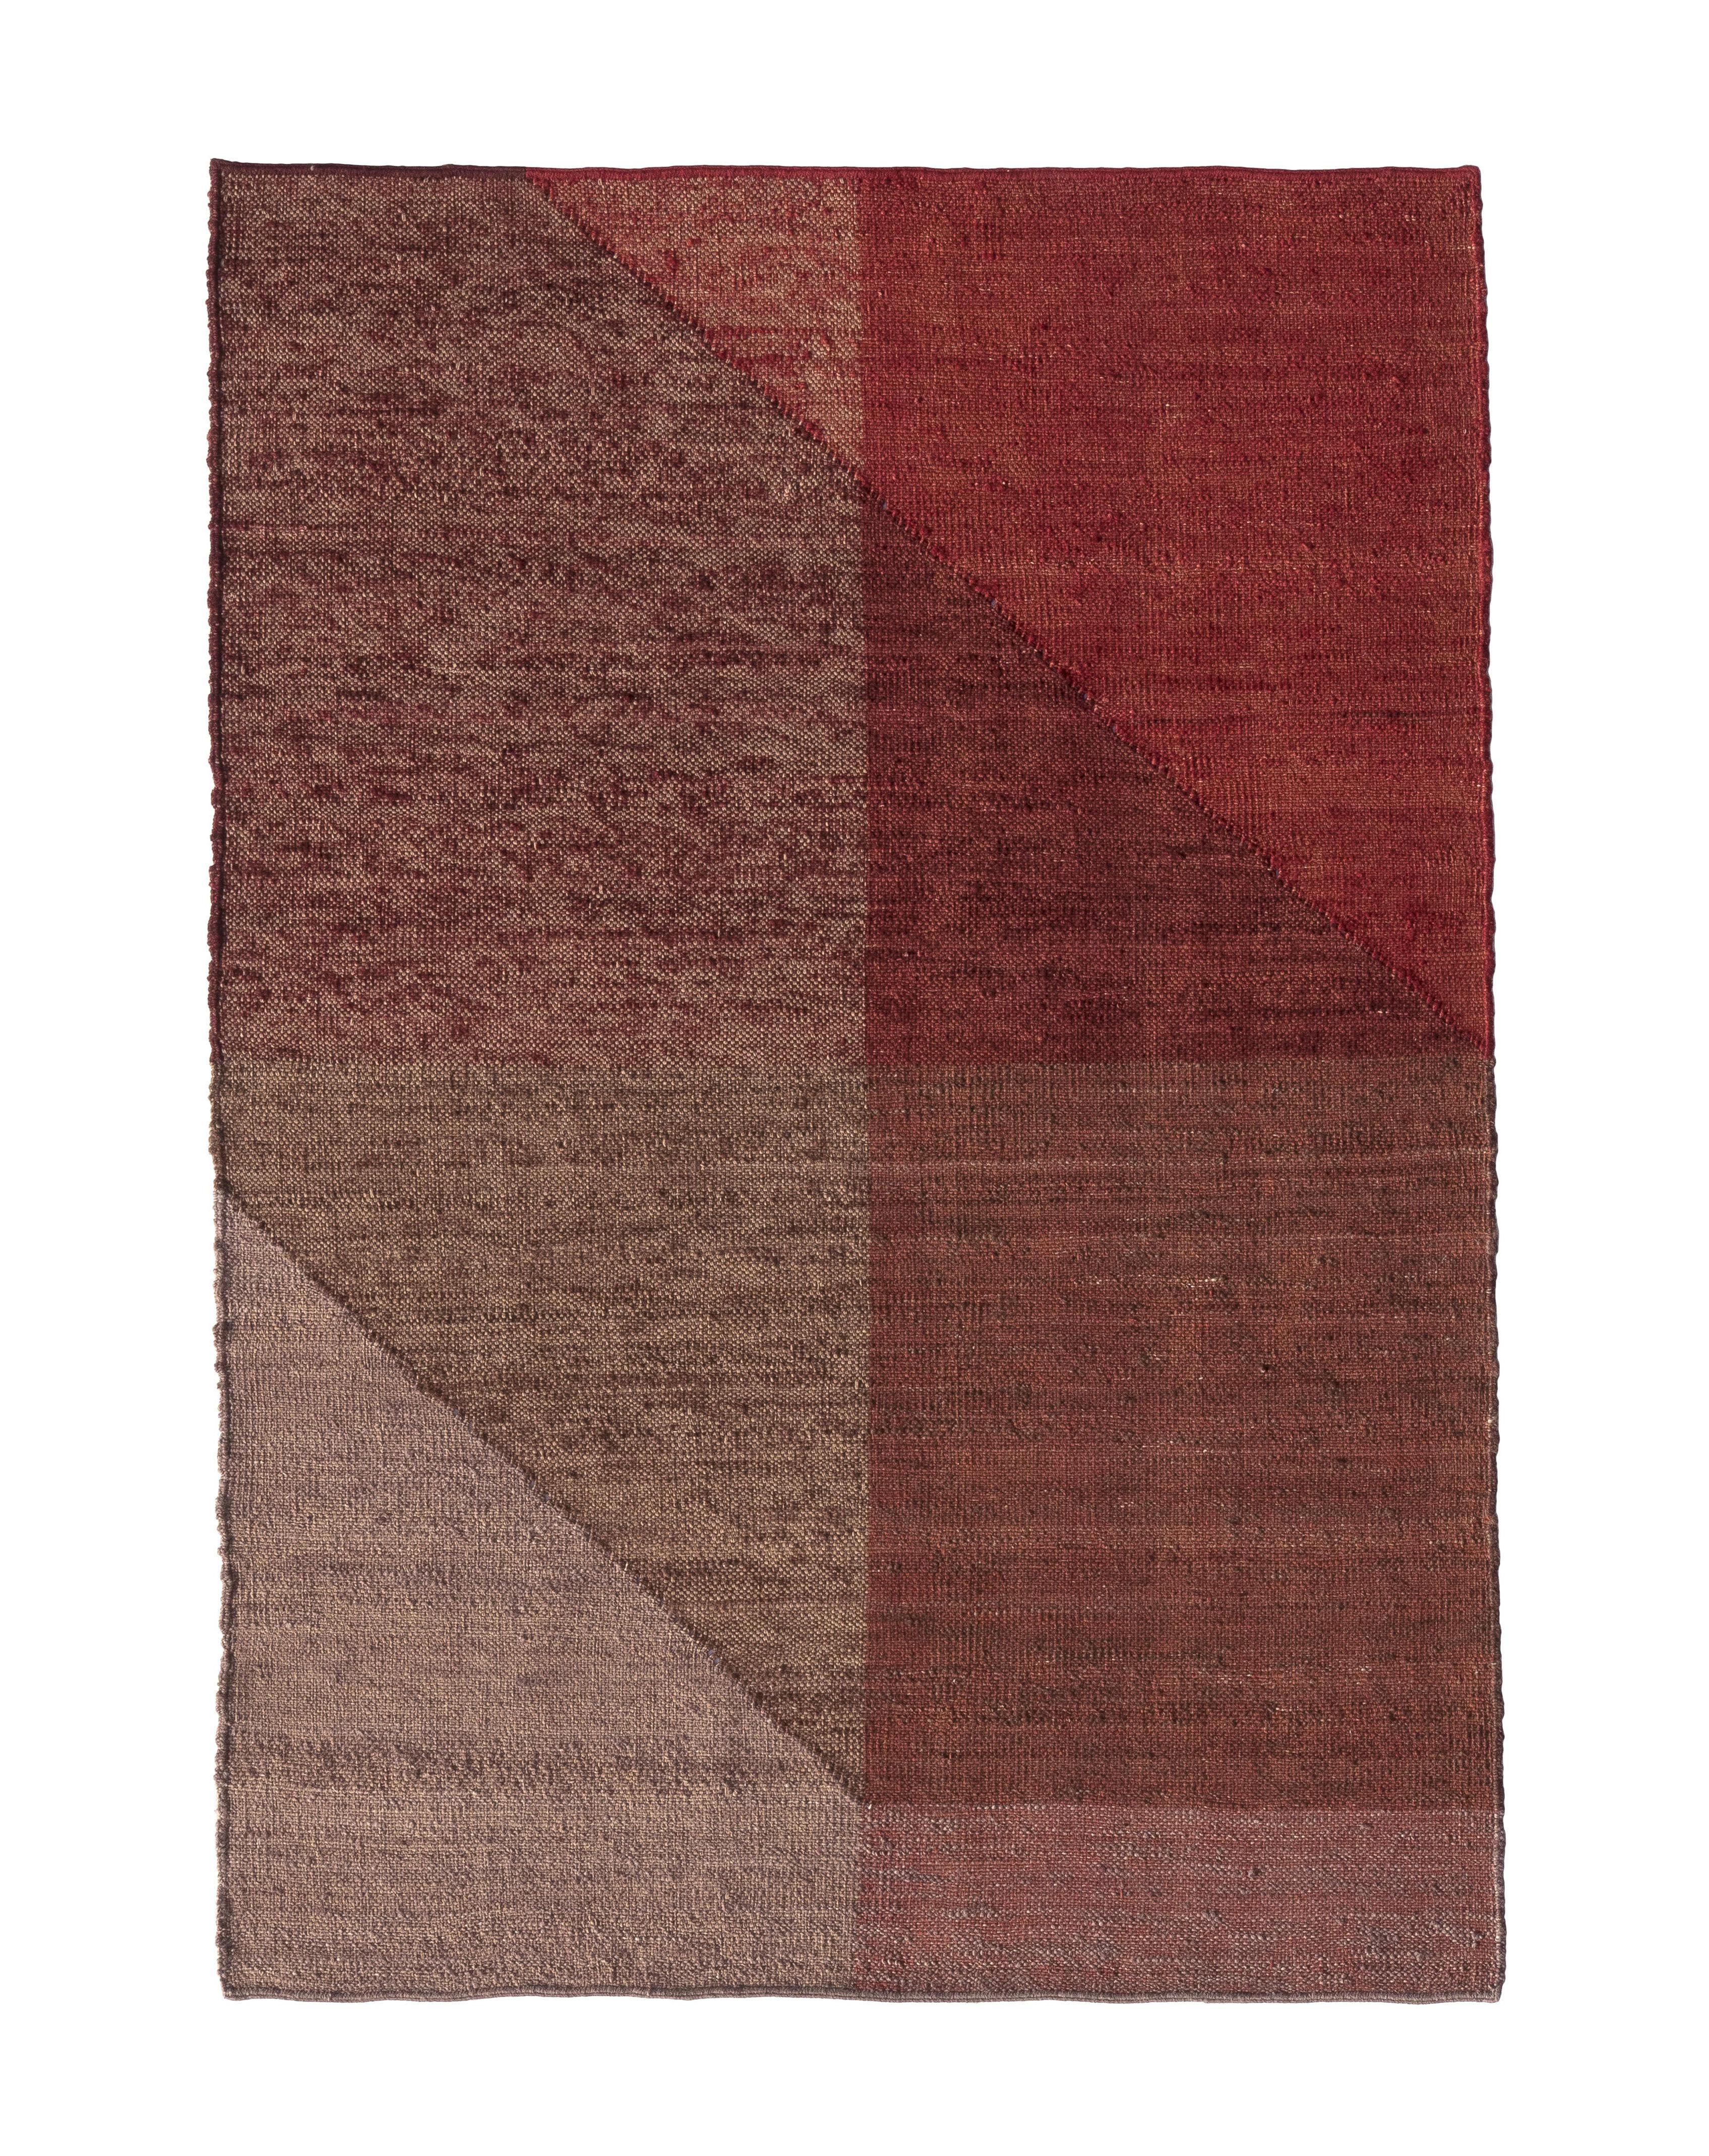 Interni - Tappeti - Tappeto Capas 1 - / 170 x 240 cm di Nanimarquina - Rosso - Lana